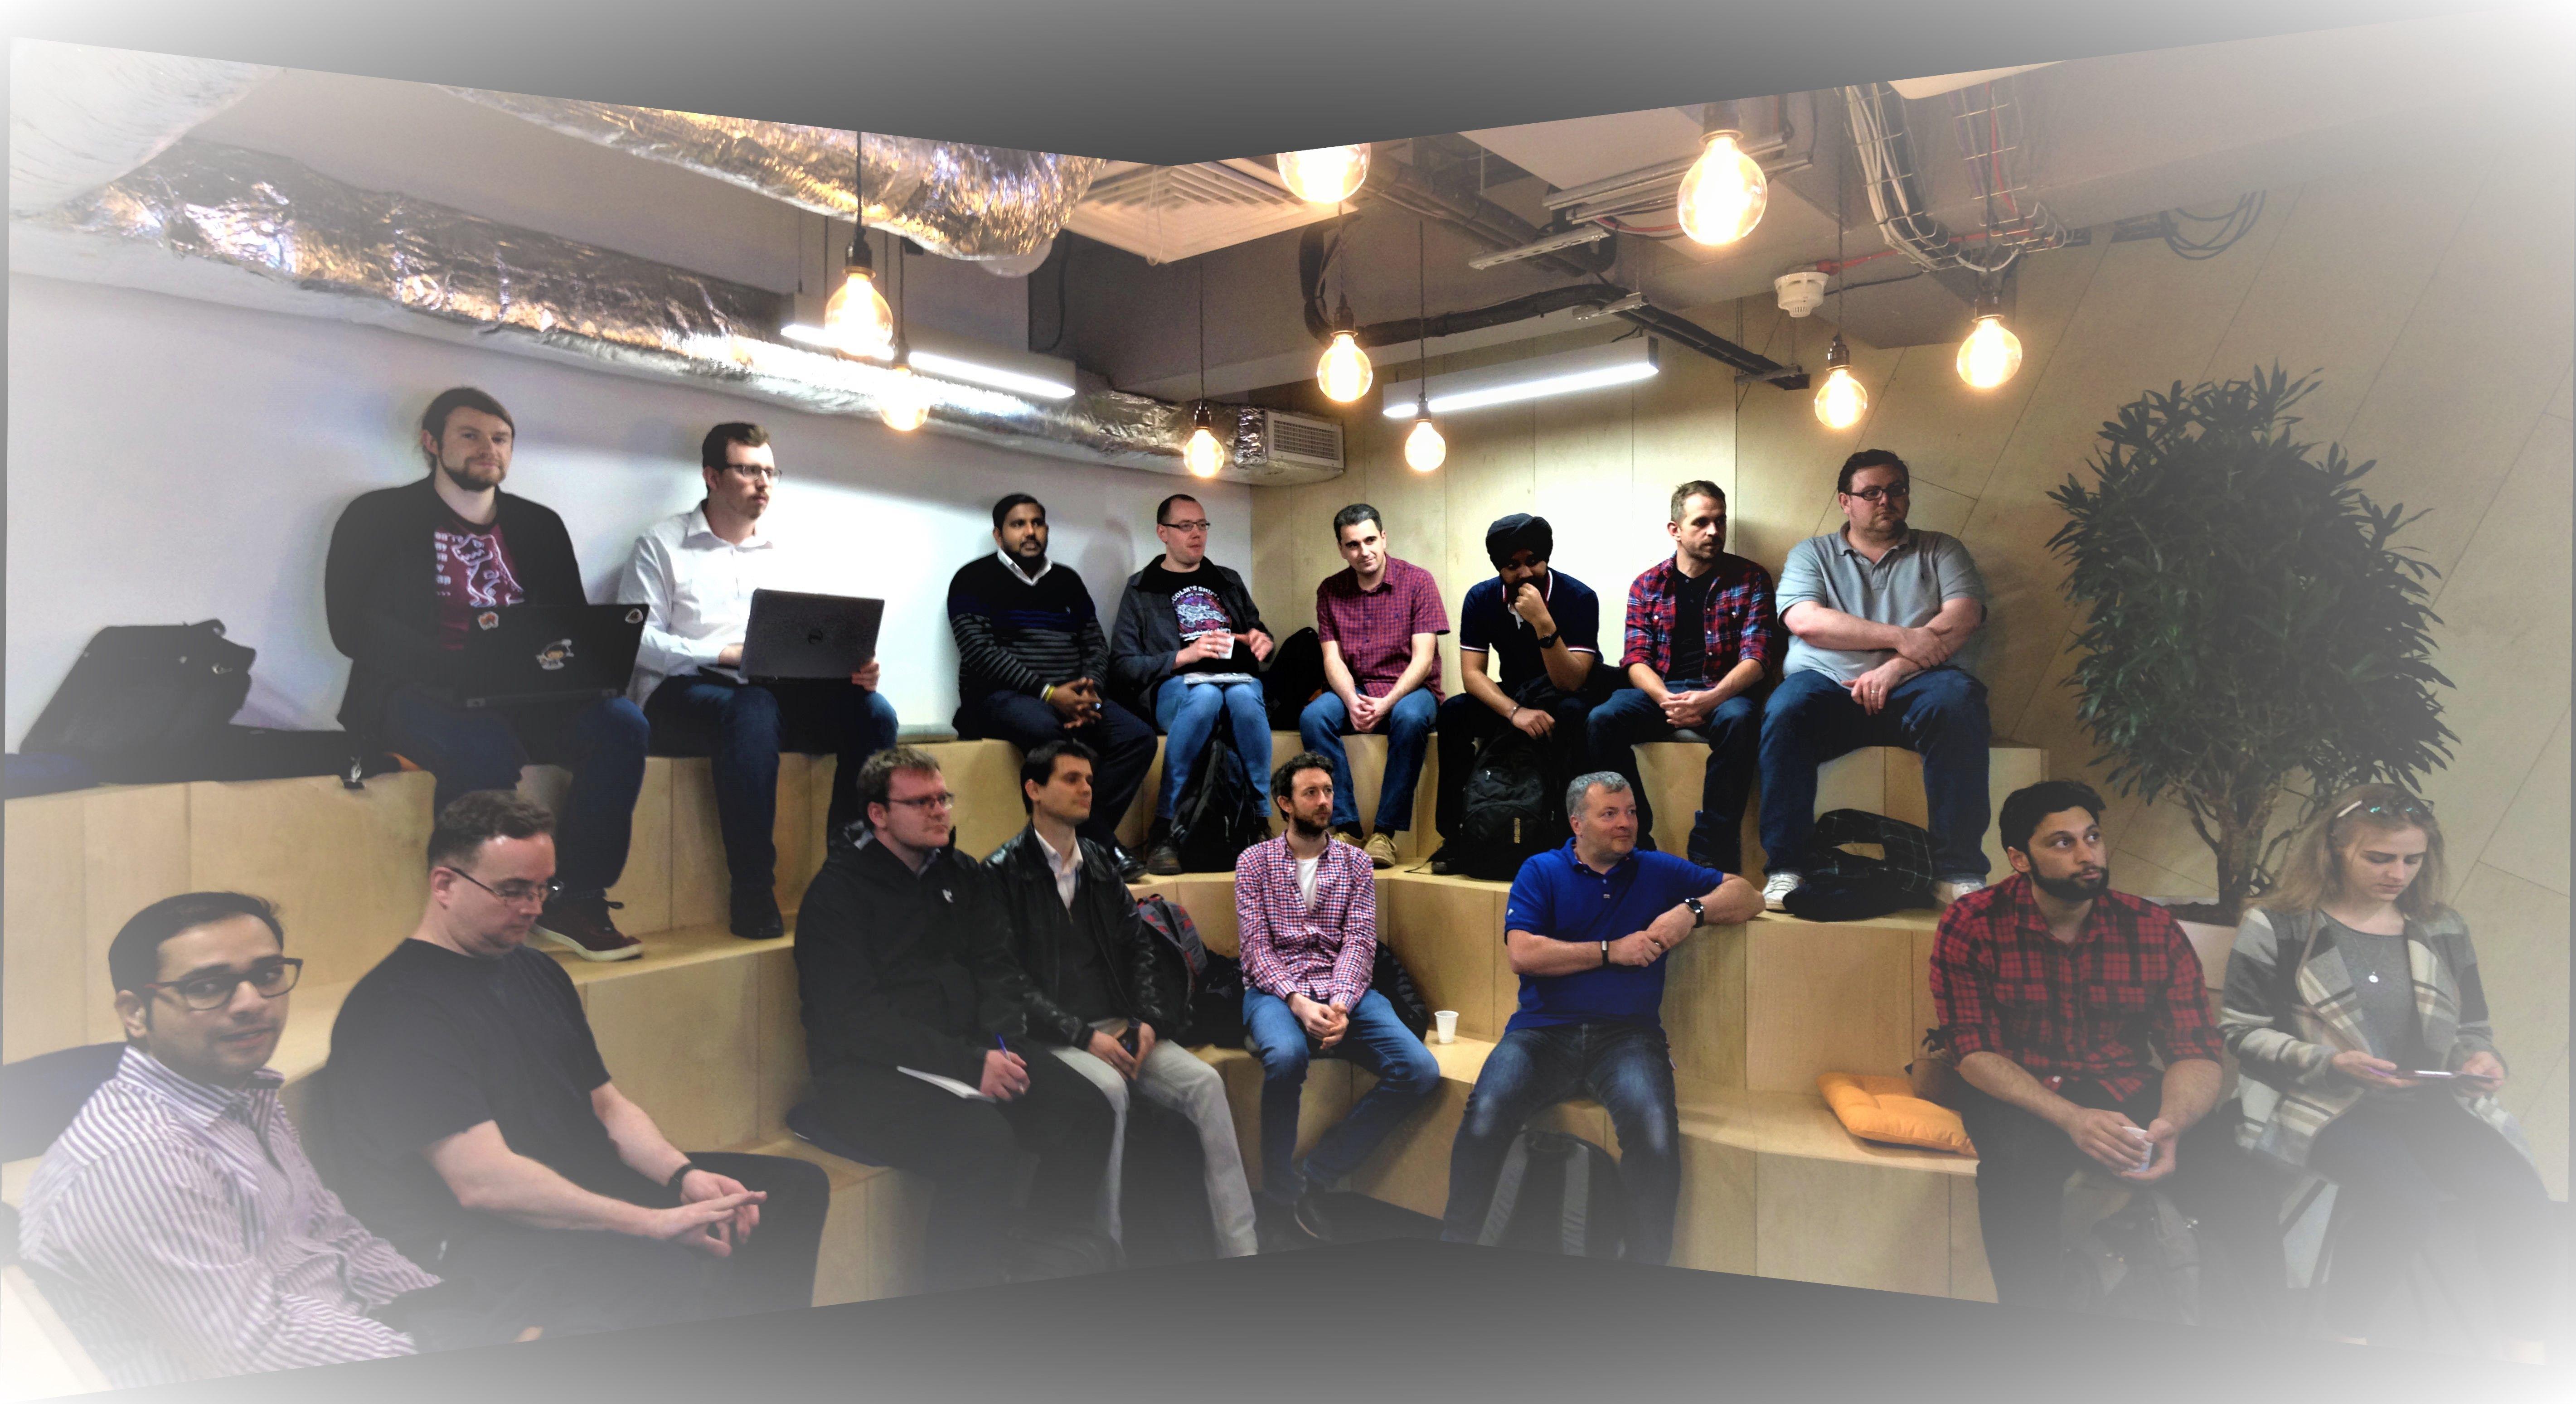 Nott's Dev Workshop